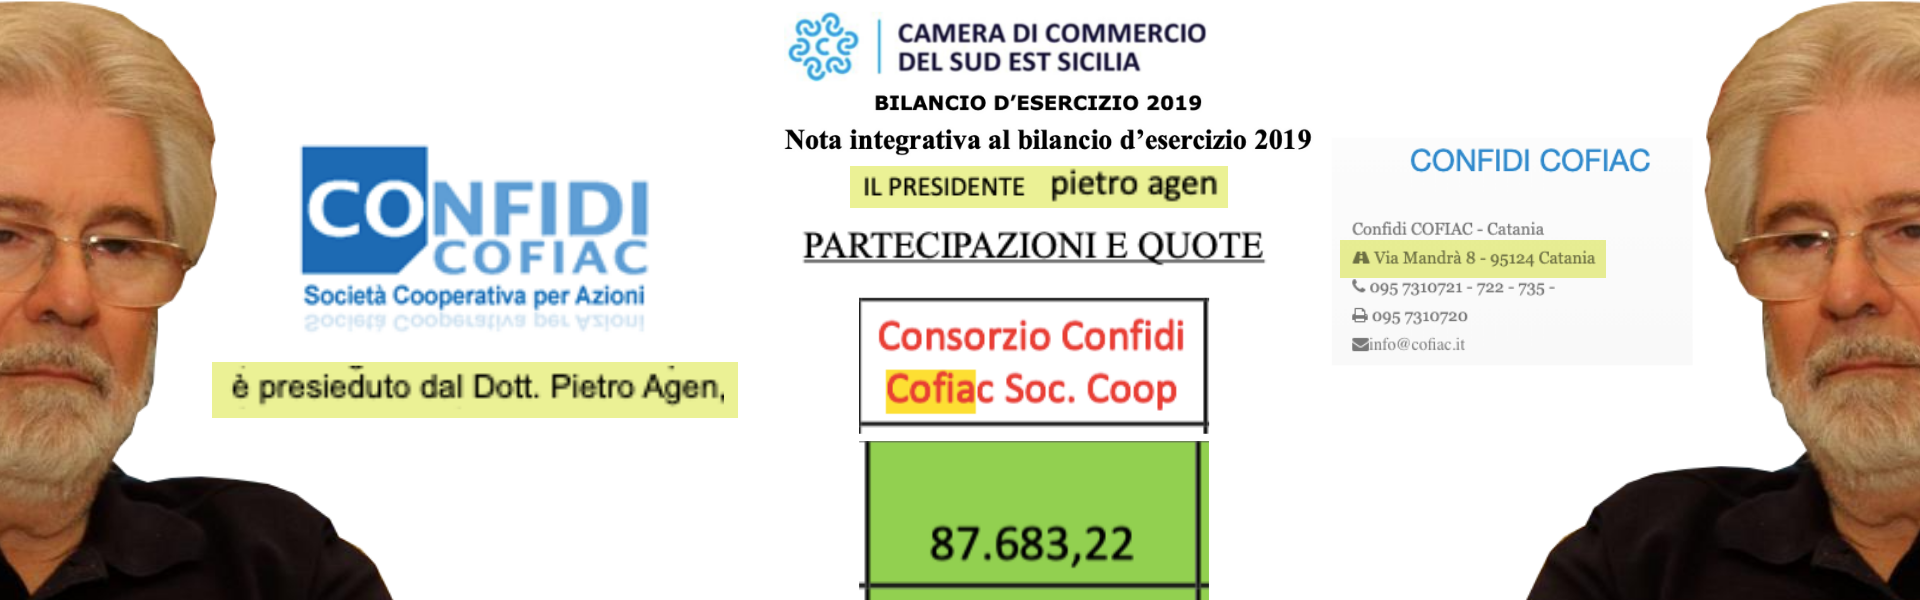 aperturaagencofiac21-1605675330.png